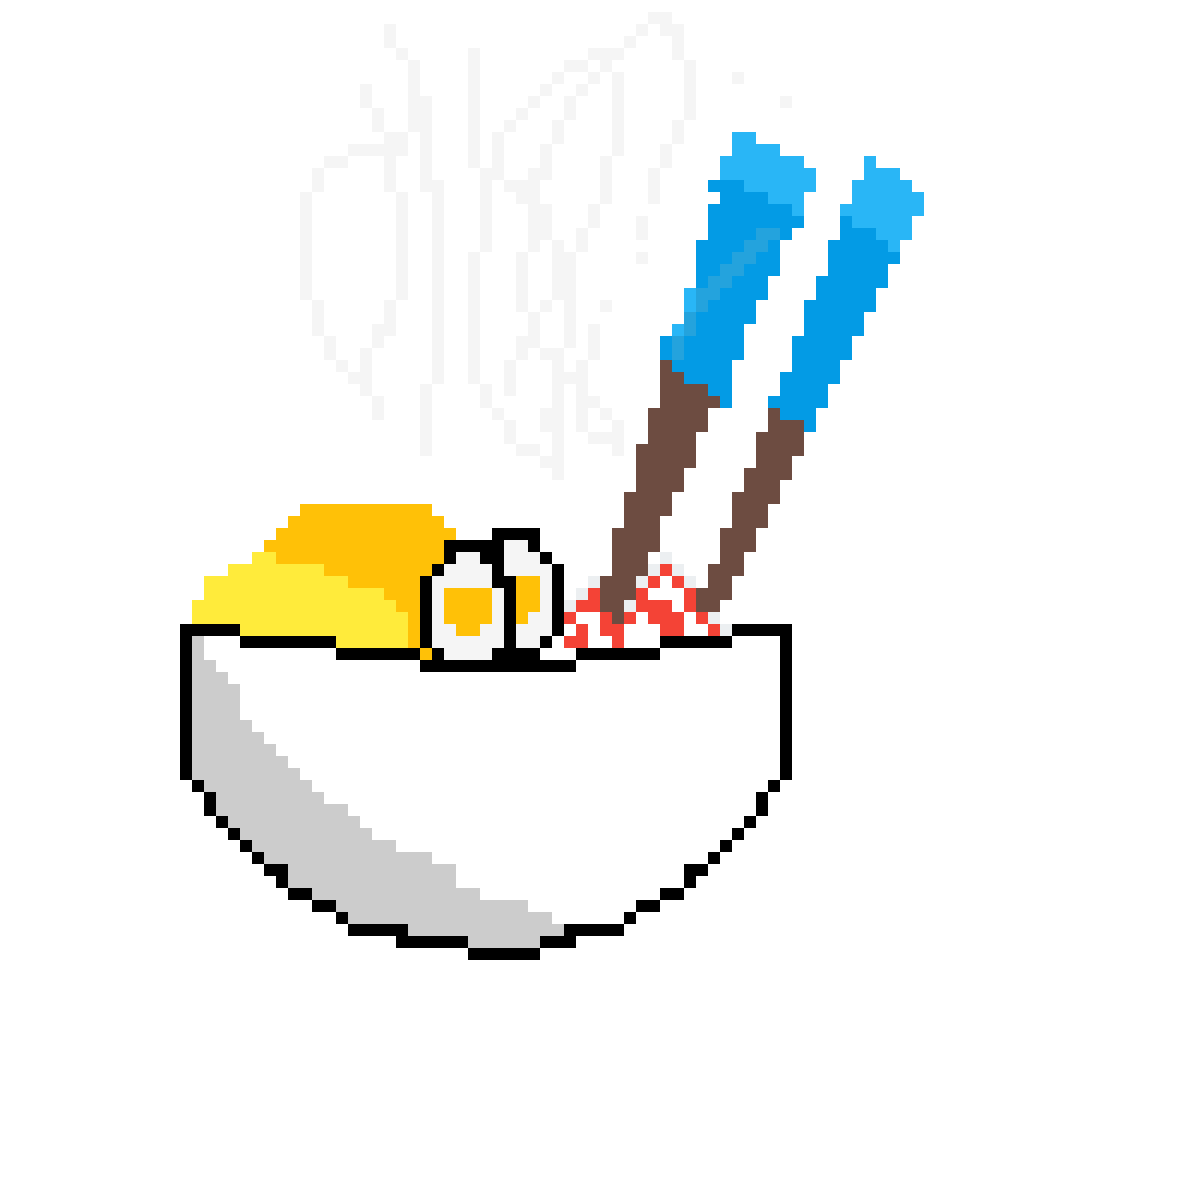 Ramen bowl by mind-bender